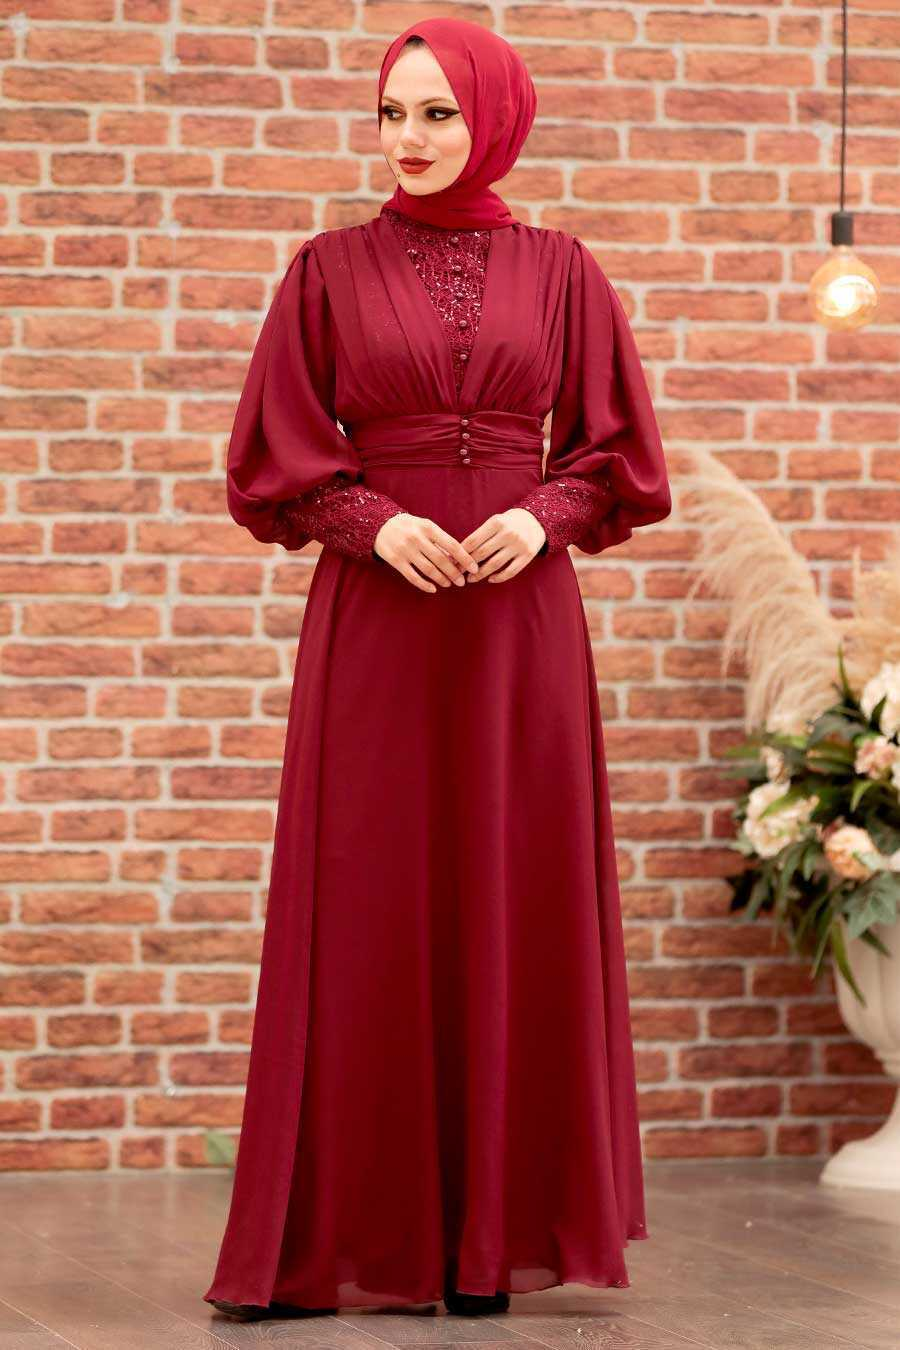 Claret Red Hijab Evening Dress 25810BR